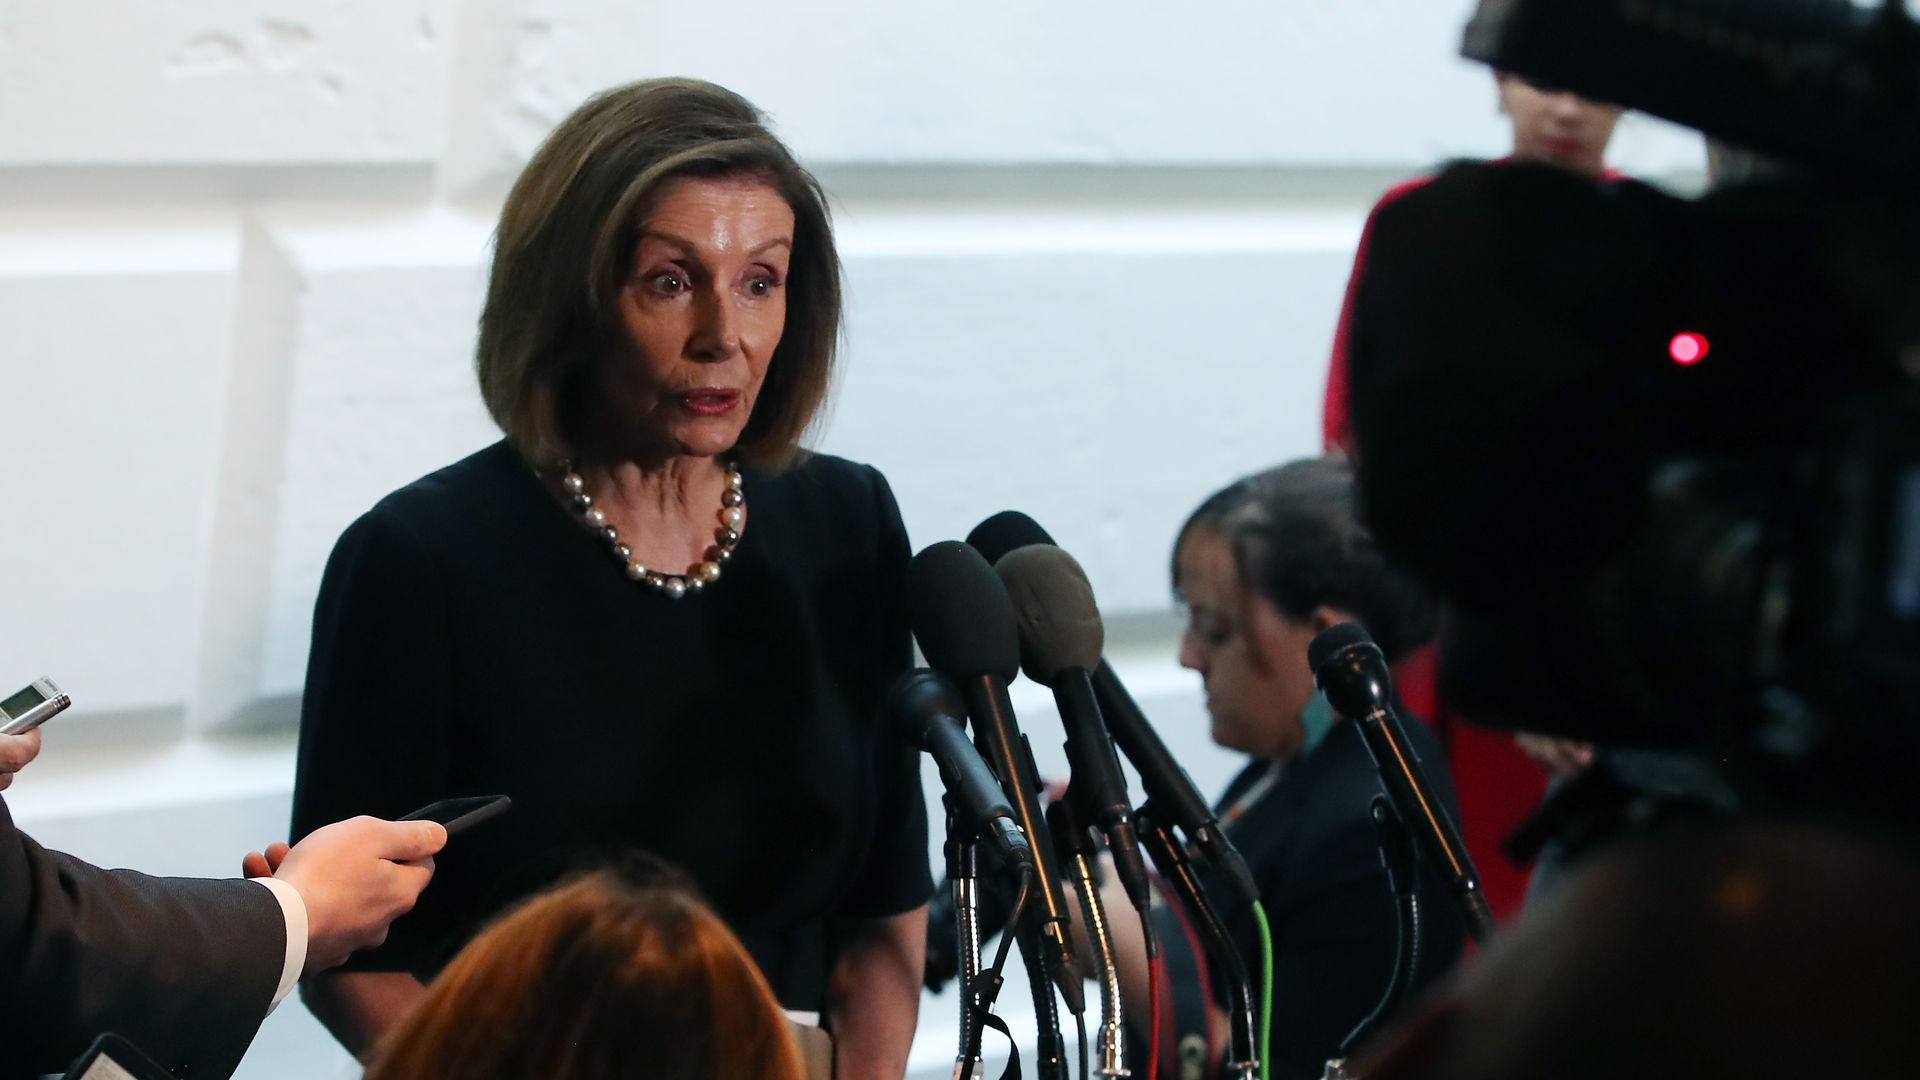 Speaker of the House Nancy Pelosi speaking with press